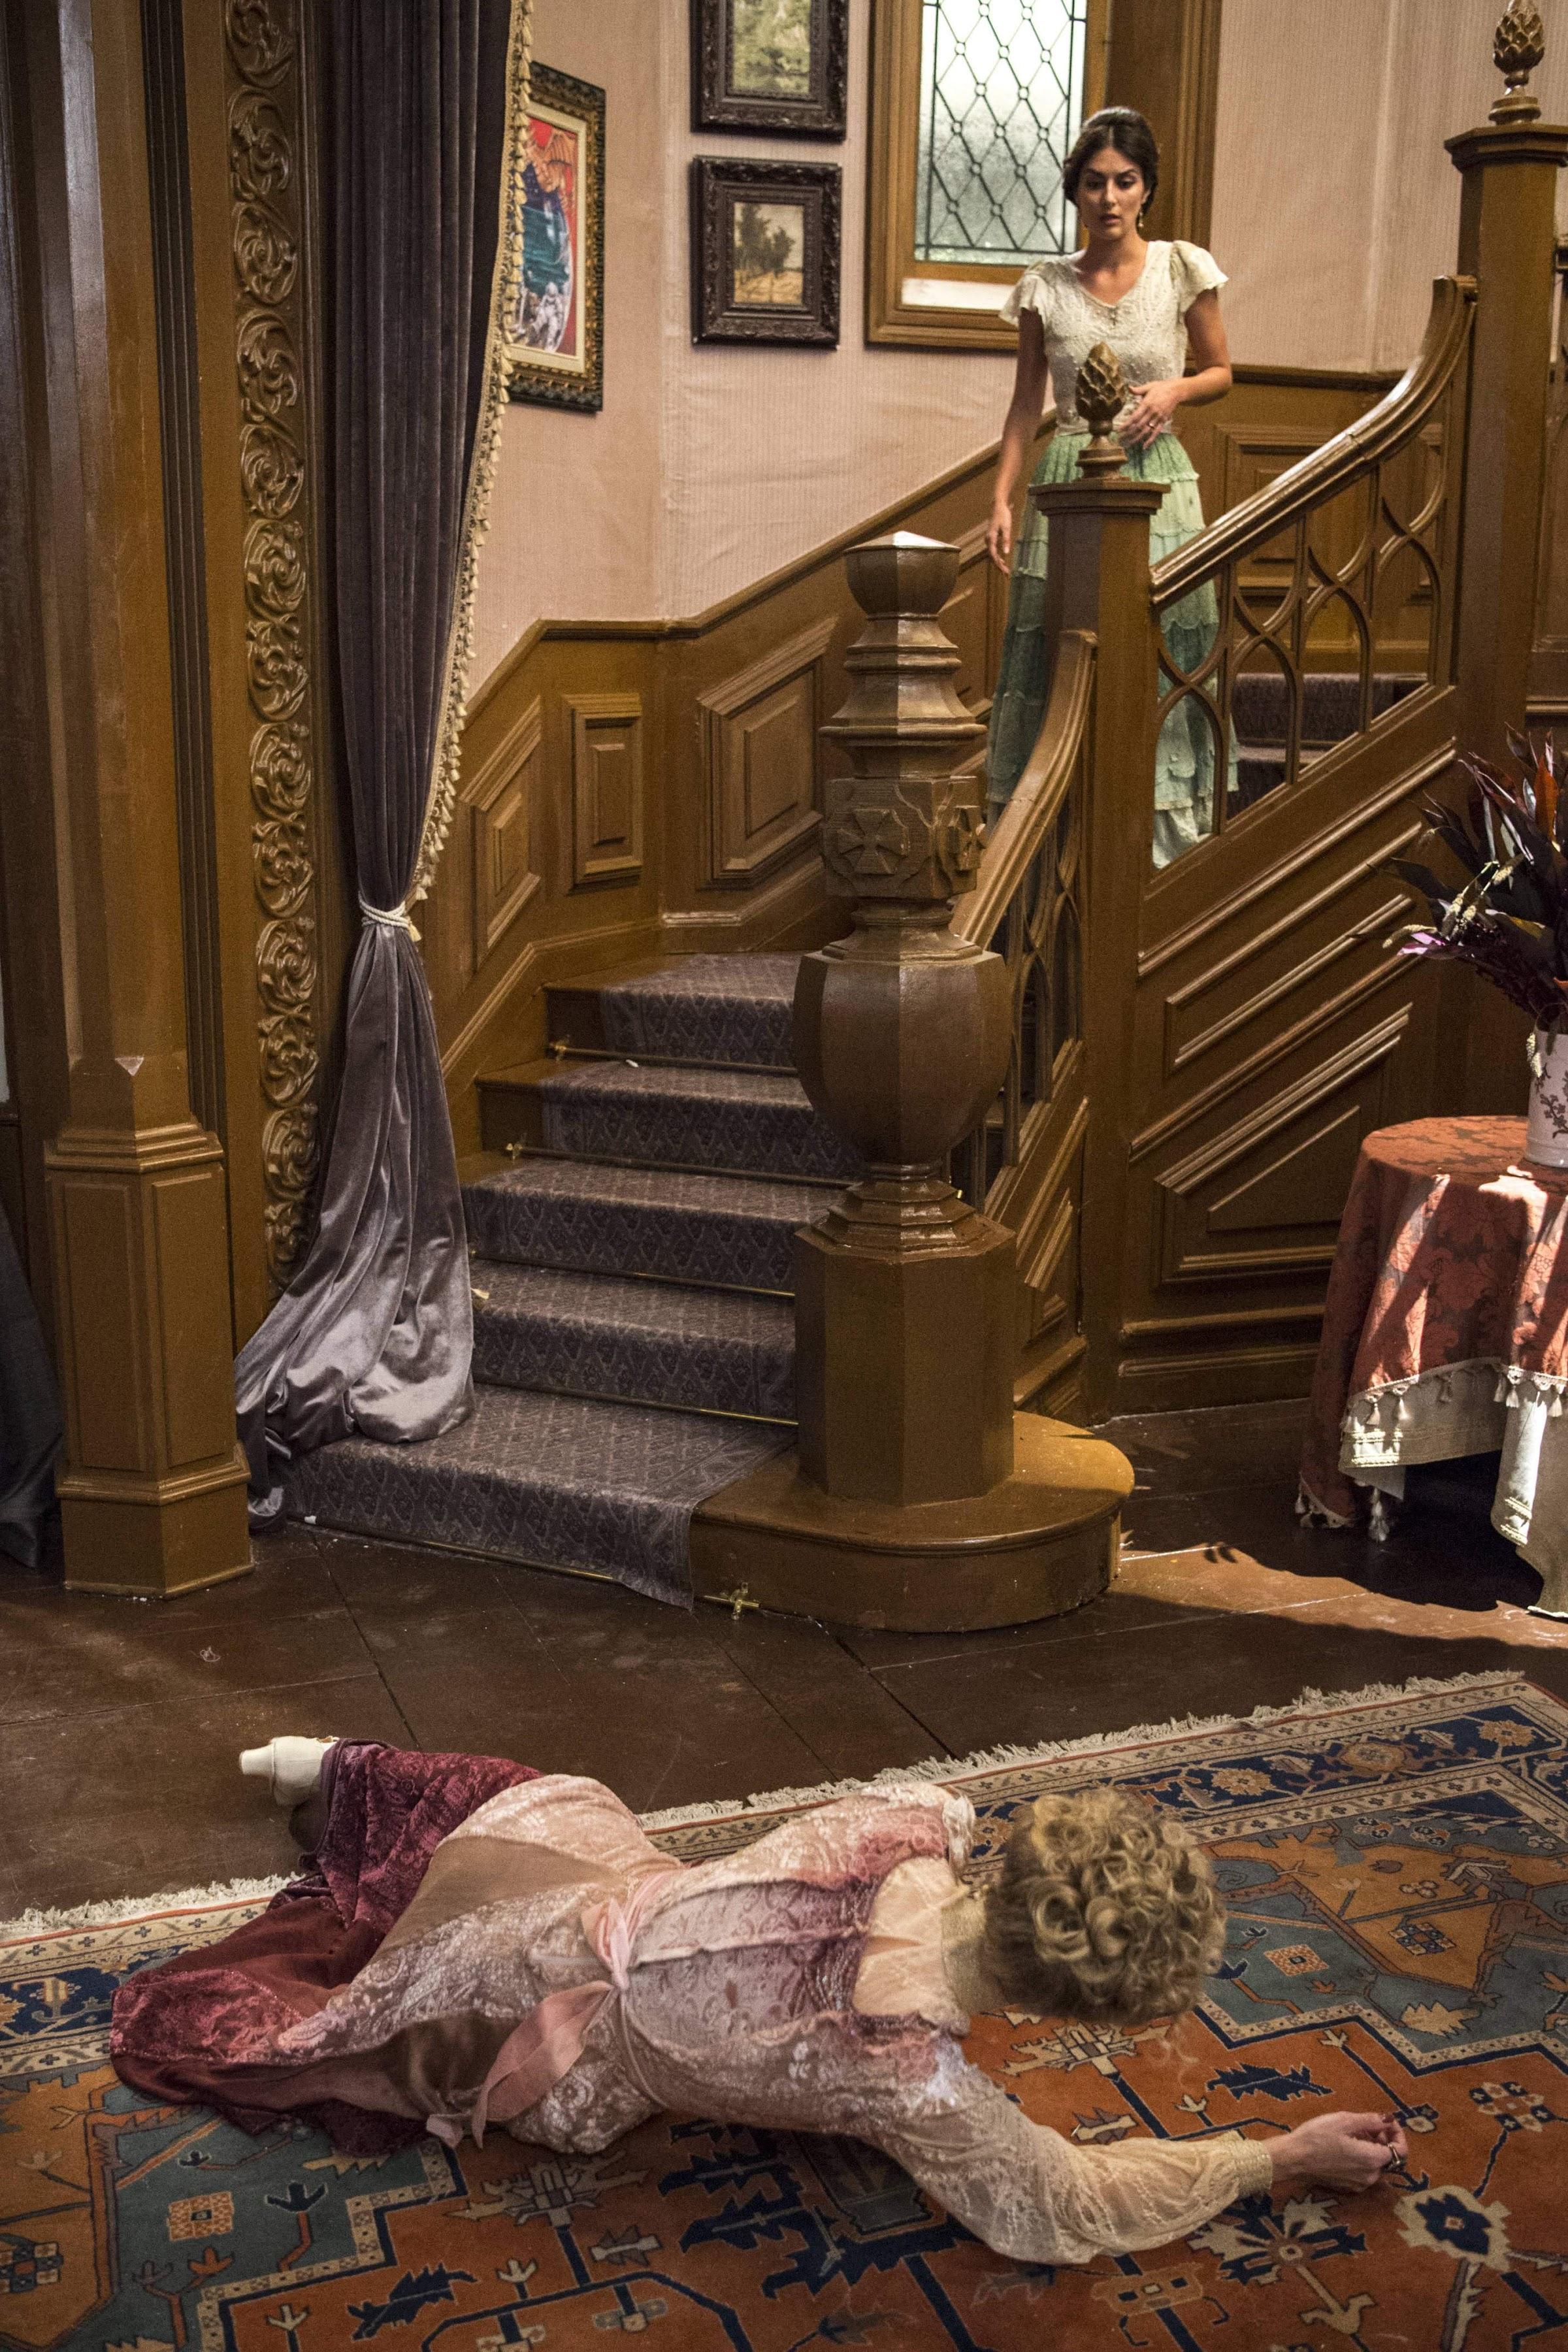 Josephine se joga do alto da escada e acusa Cecília de empurrá-la